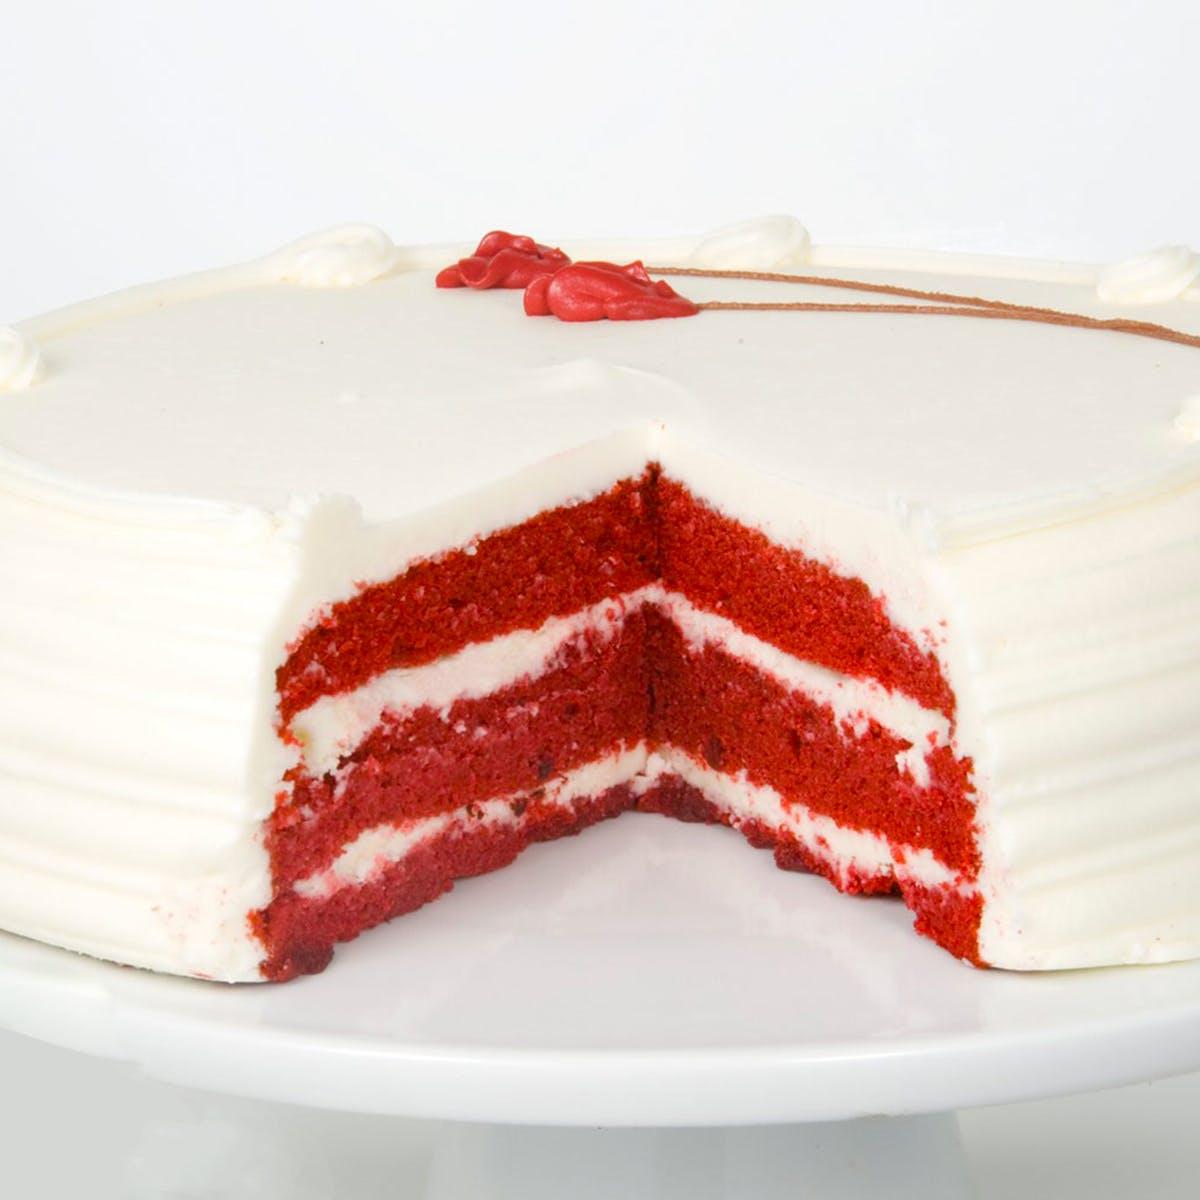 Super Oprahs Favorite Red Velvet Birthday Cake By Carousel Cakes Funny Birthday Cards Online Elaedamsfinfo